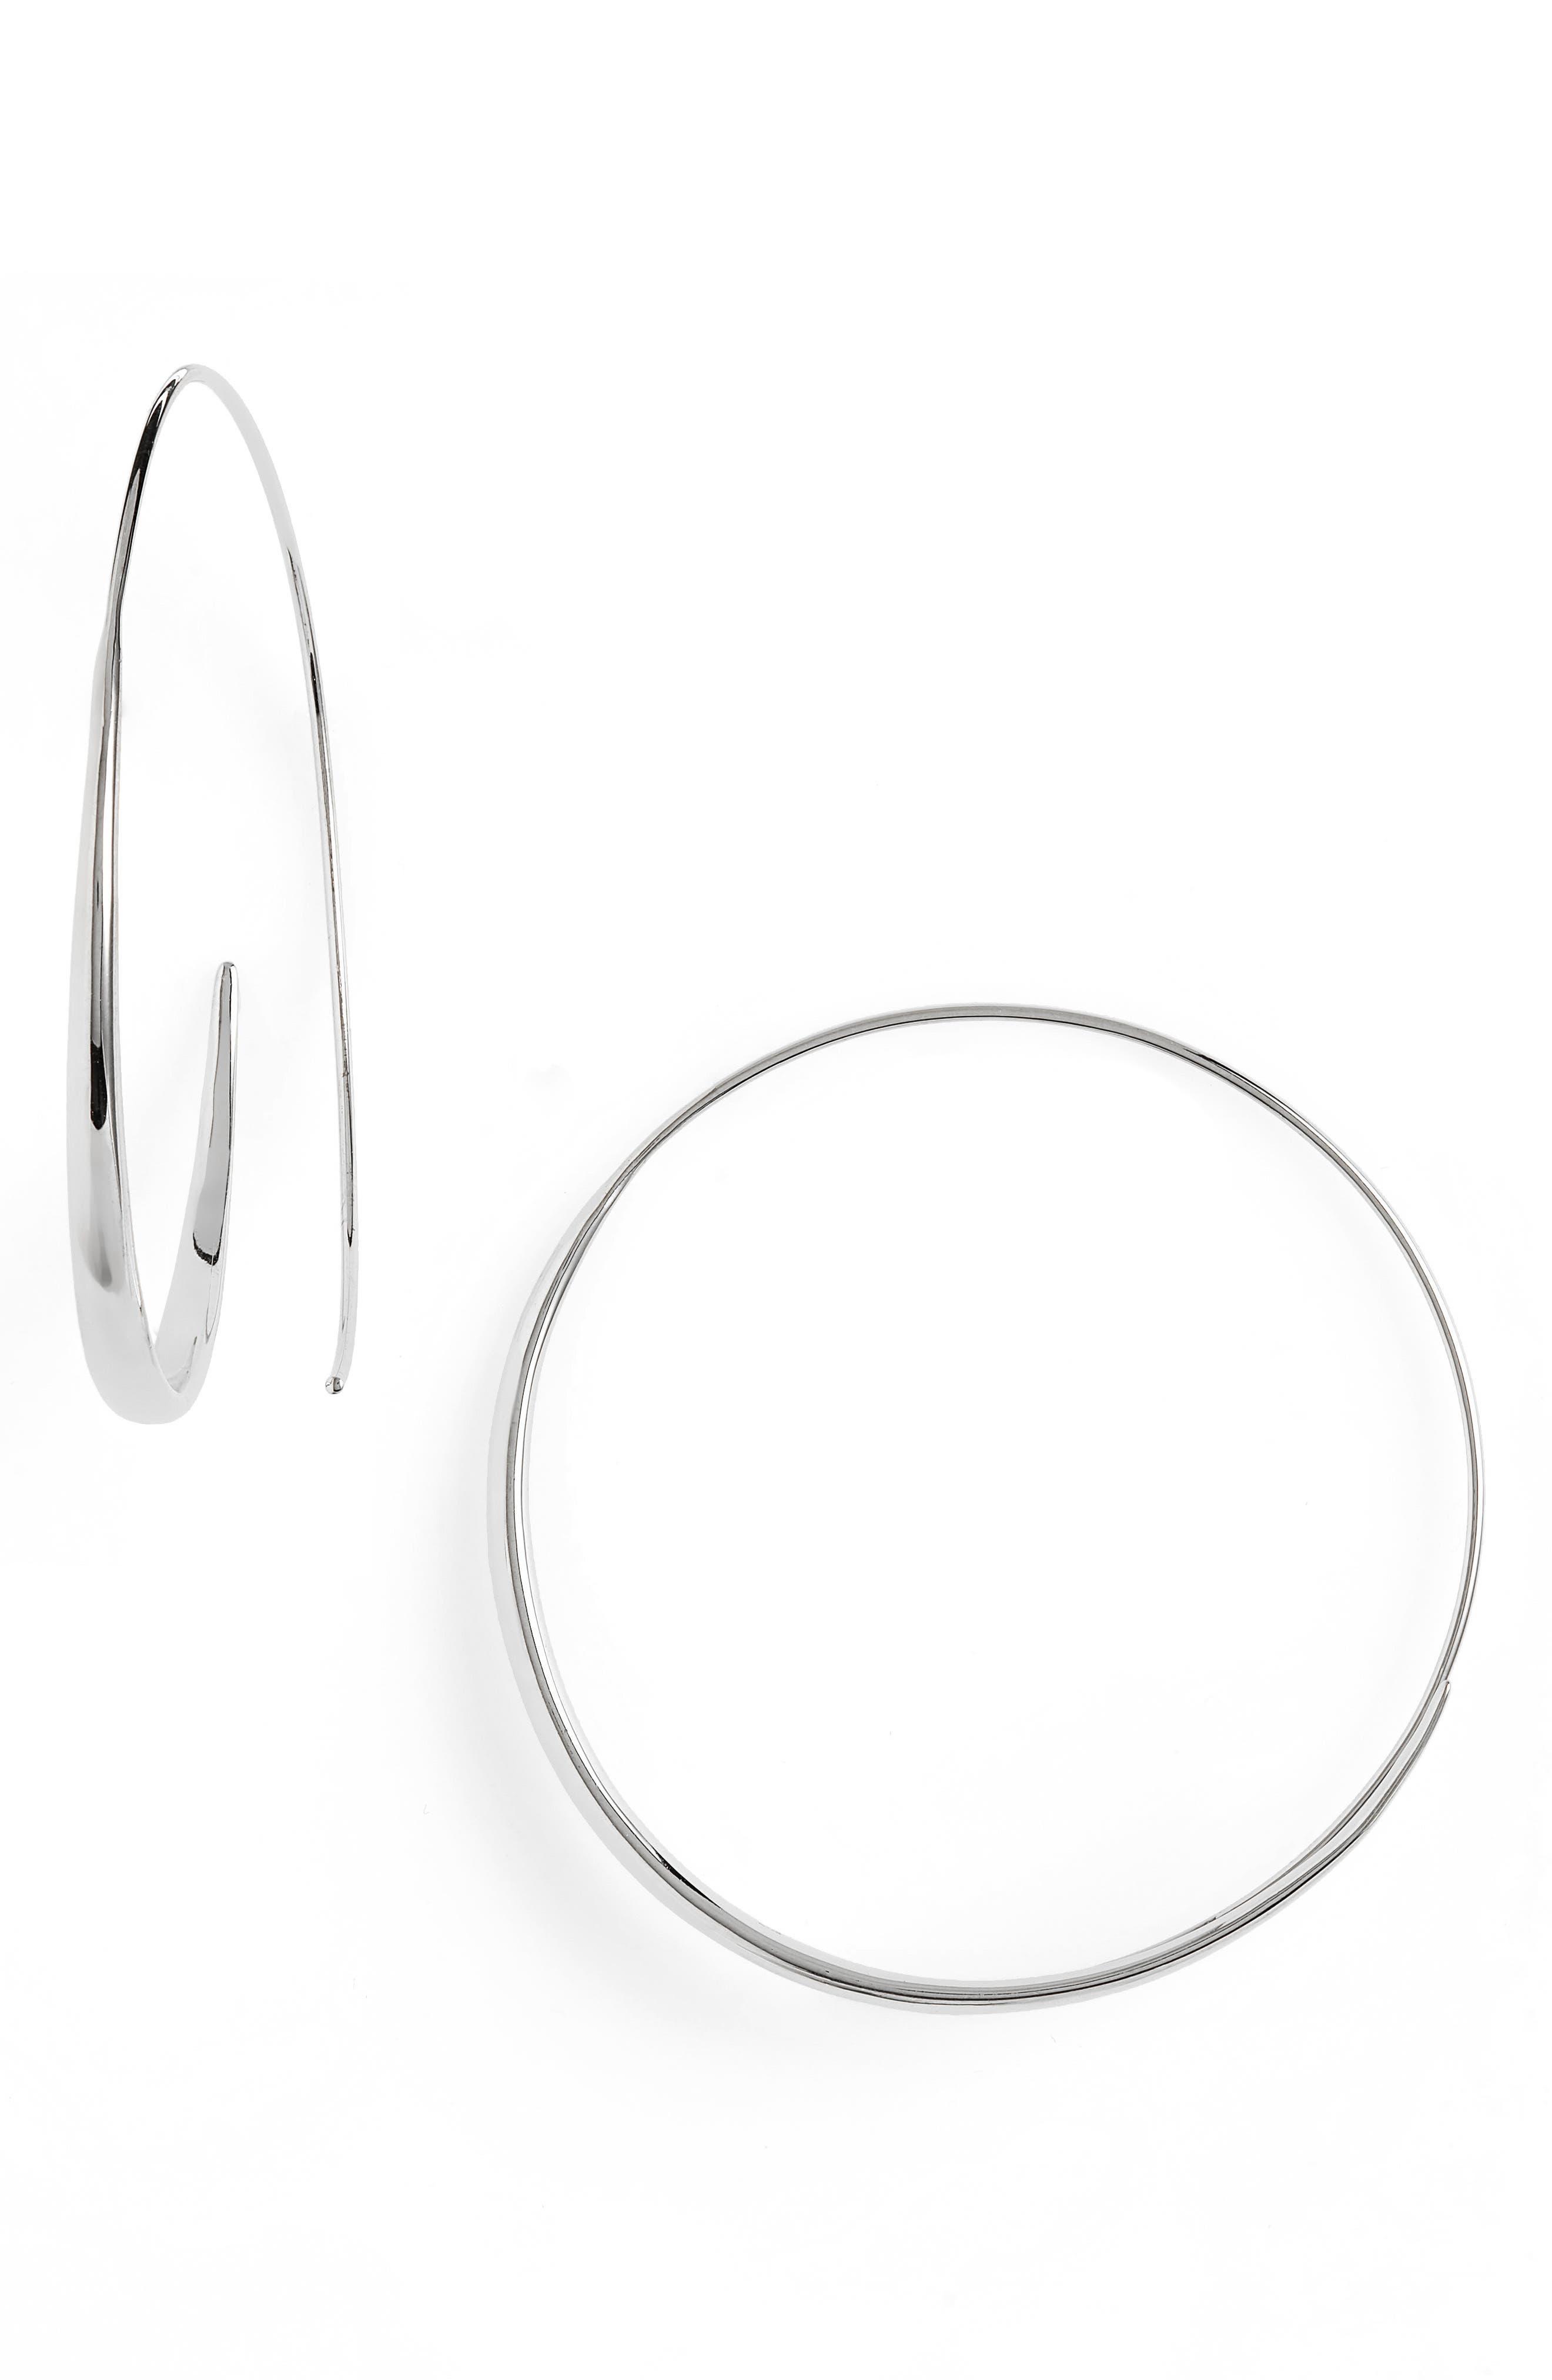 Extra Large Ear Loop Earrings,                         Main,                         color, 925 STERLING SILVER